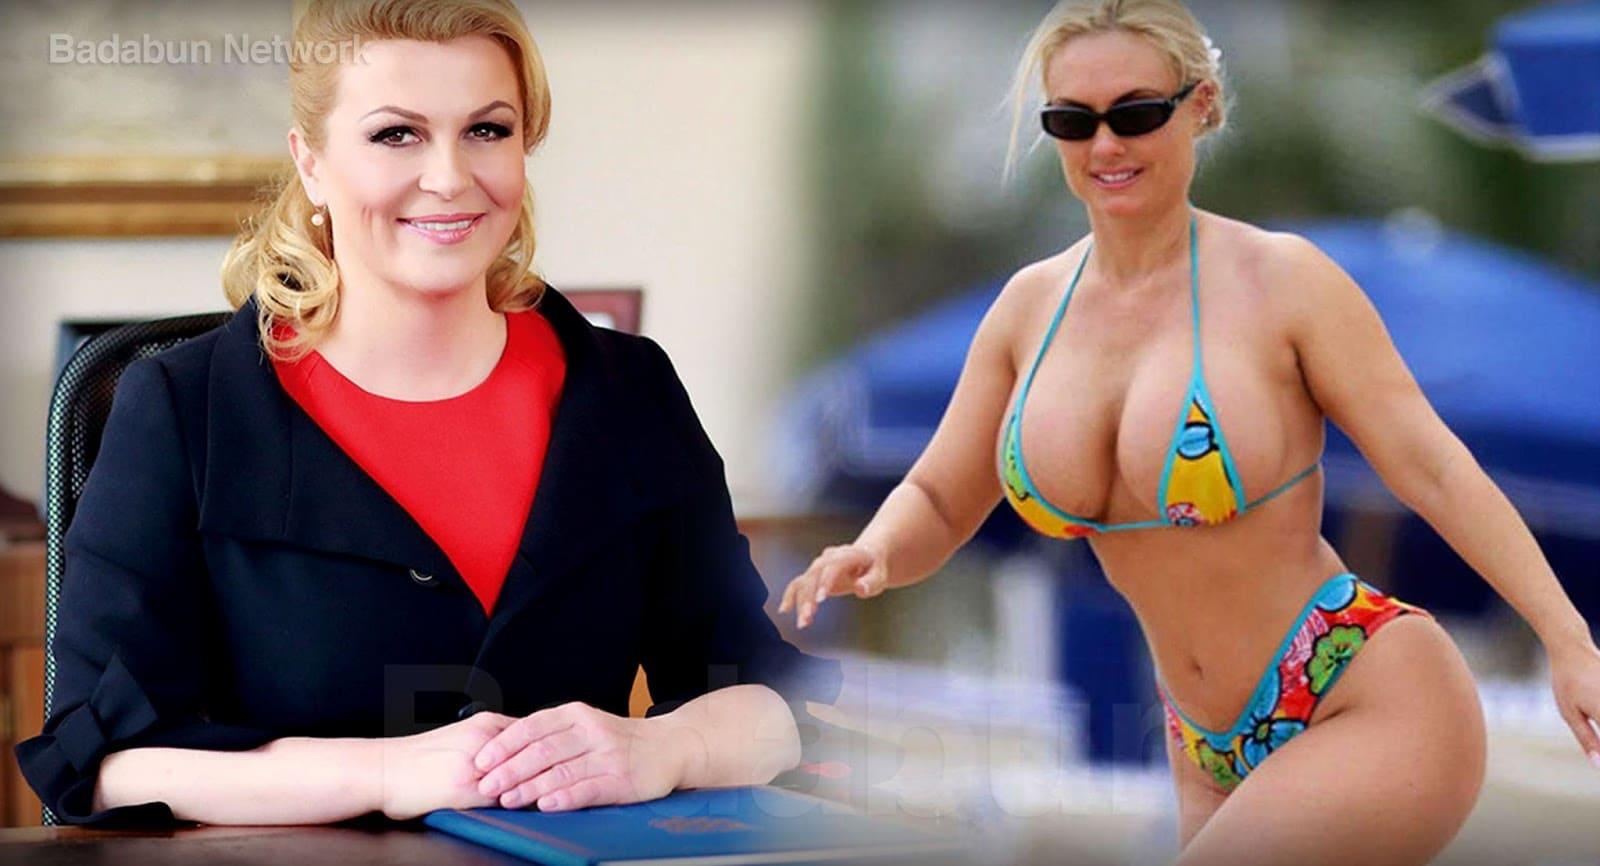 Президент Хорватии: фото в купальнике на пляже в молодости, сейчас